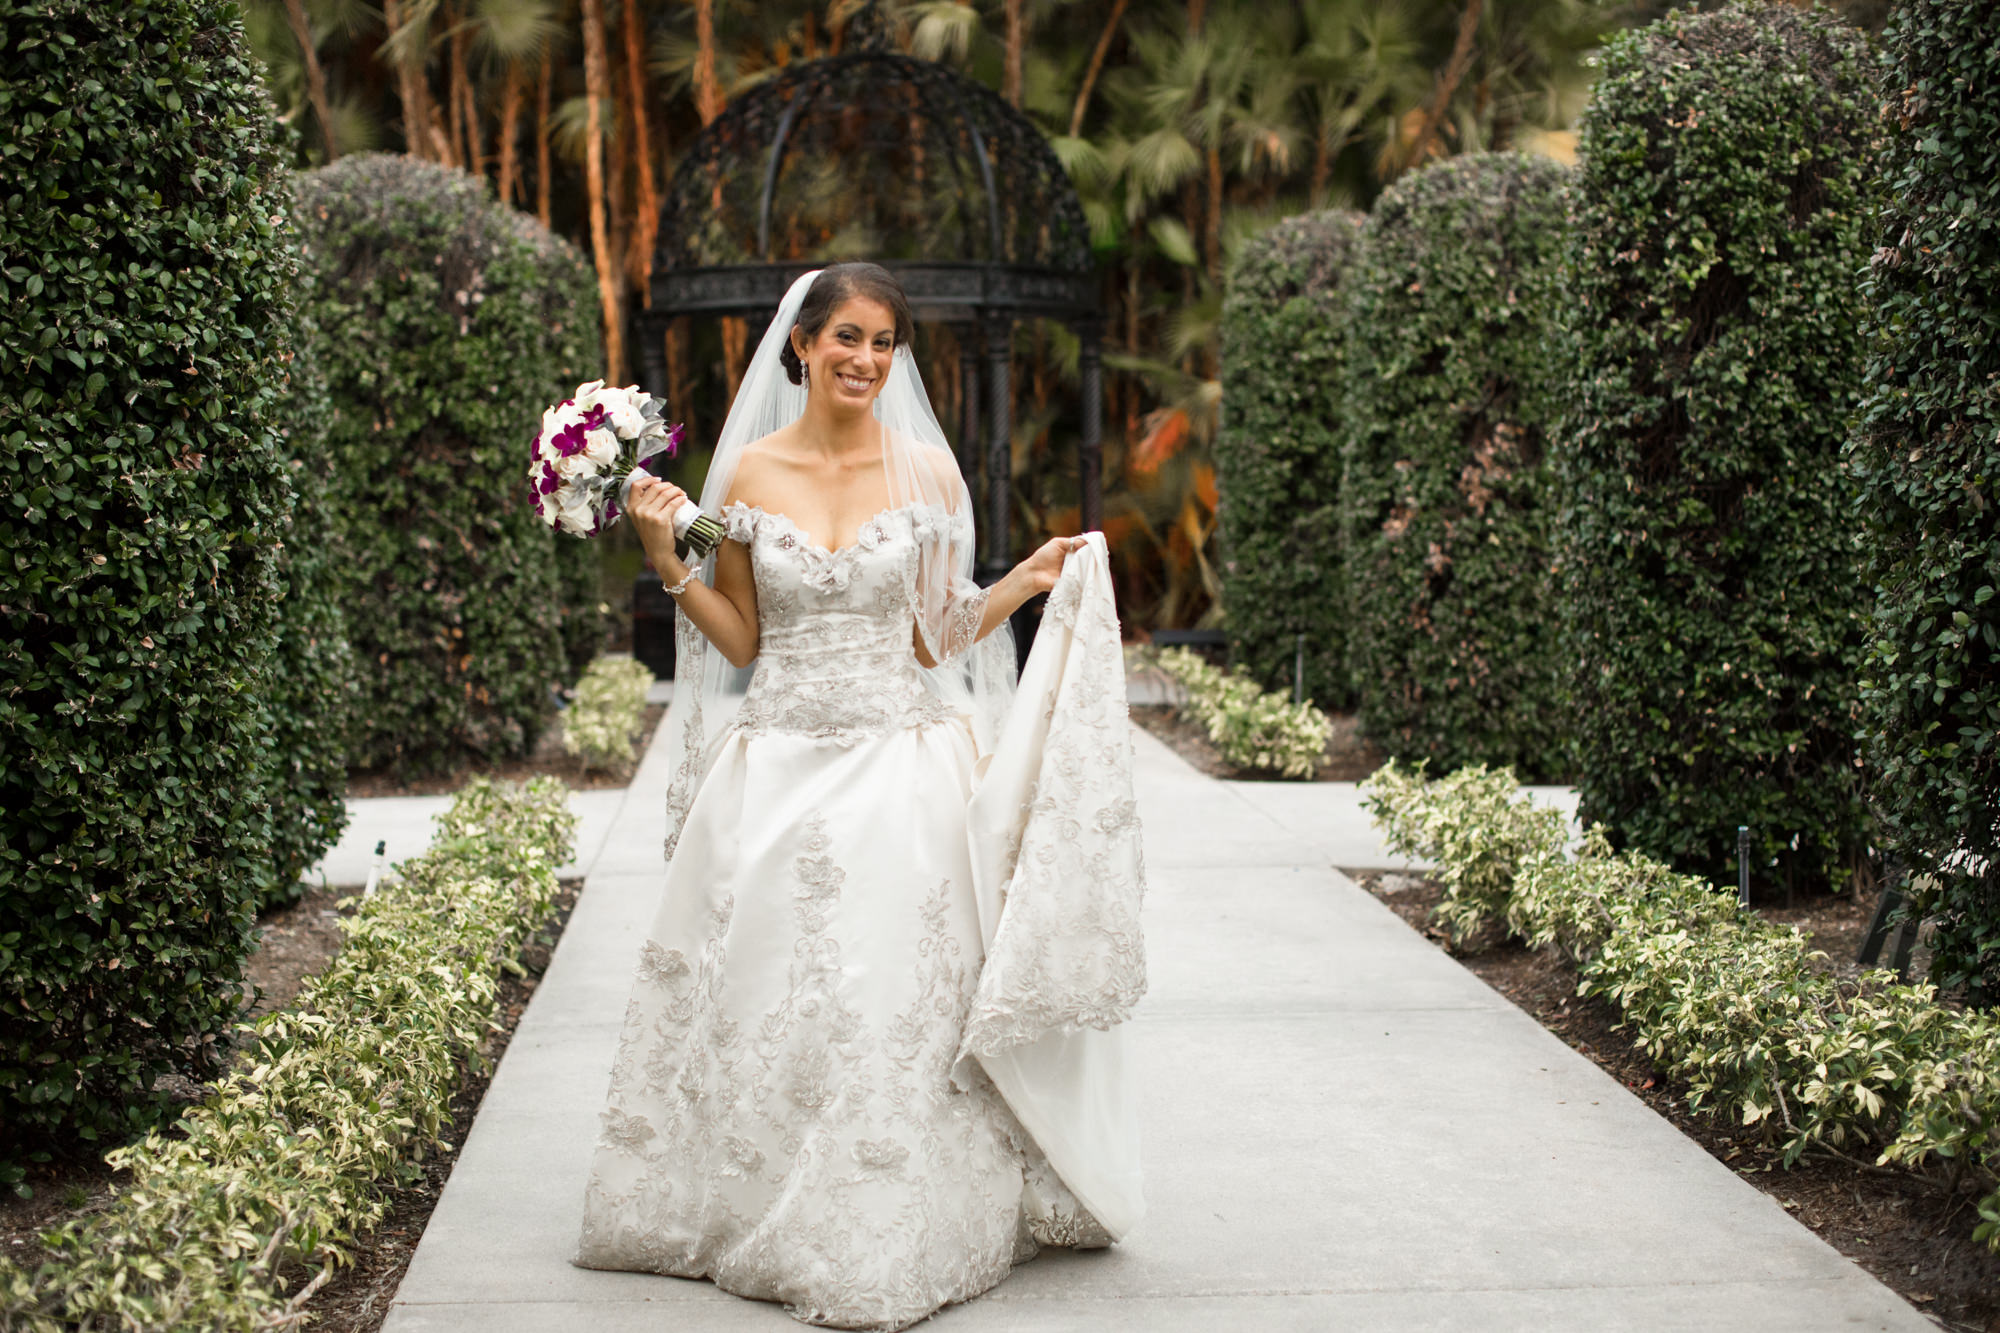 Benvenuto_Wedding_catholic_Florida_Bride-Groom-77.jpg